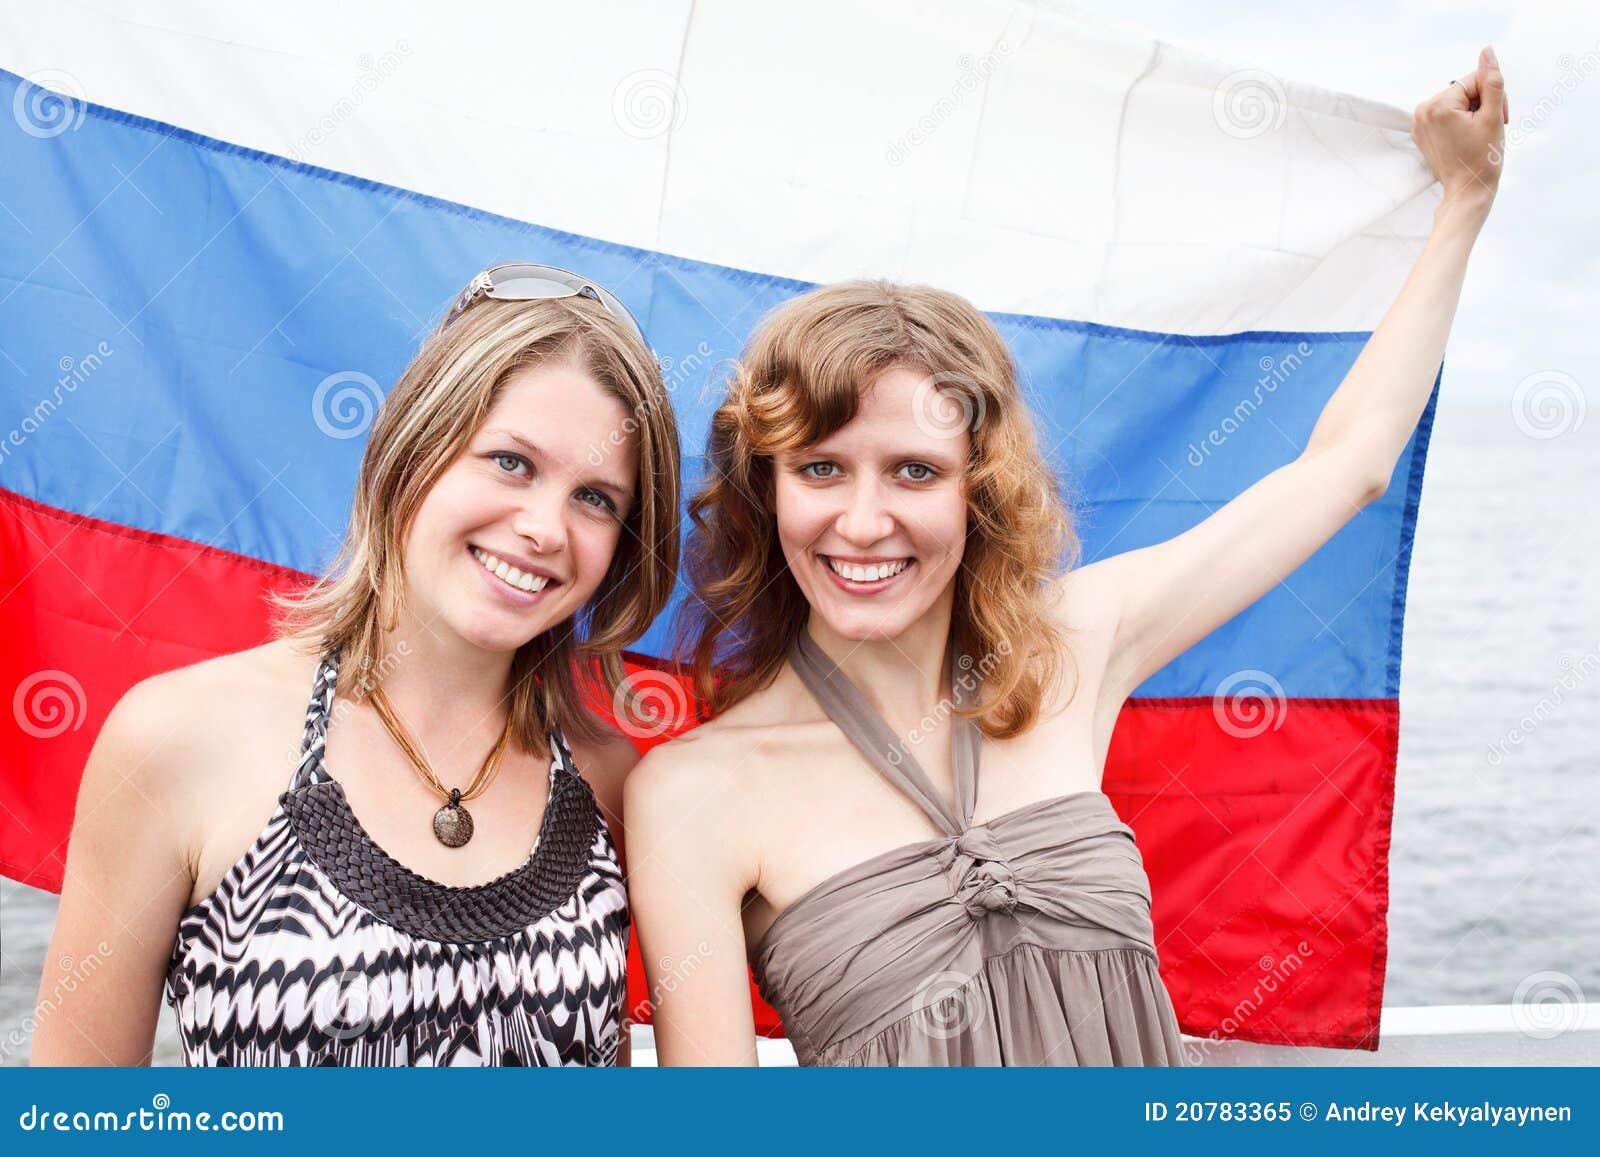 Russische Frau Oralsex - ohsexfilmcom